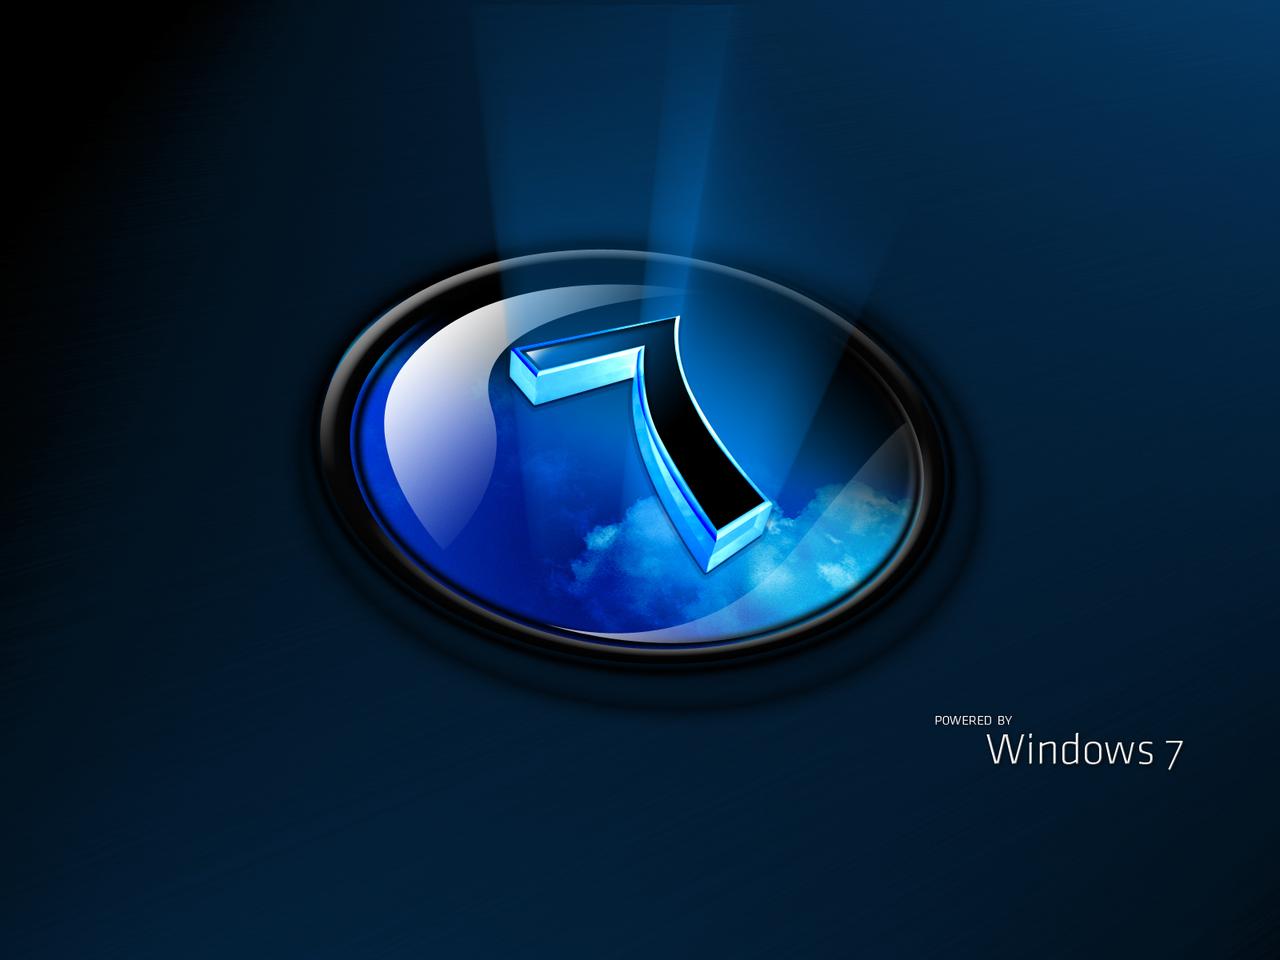 Labels Windows 7 Windows 7 HD Wallpapers Windows 7 Wallpapers 1280x960